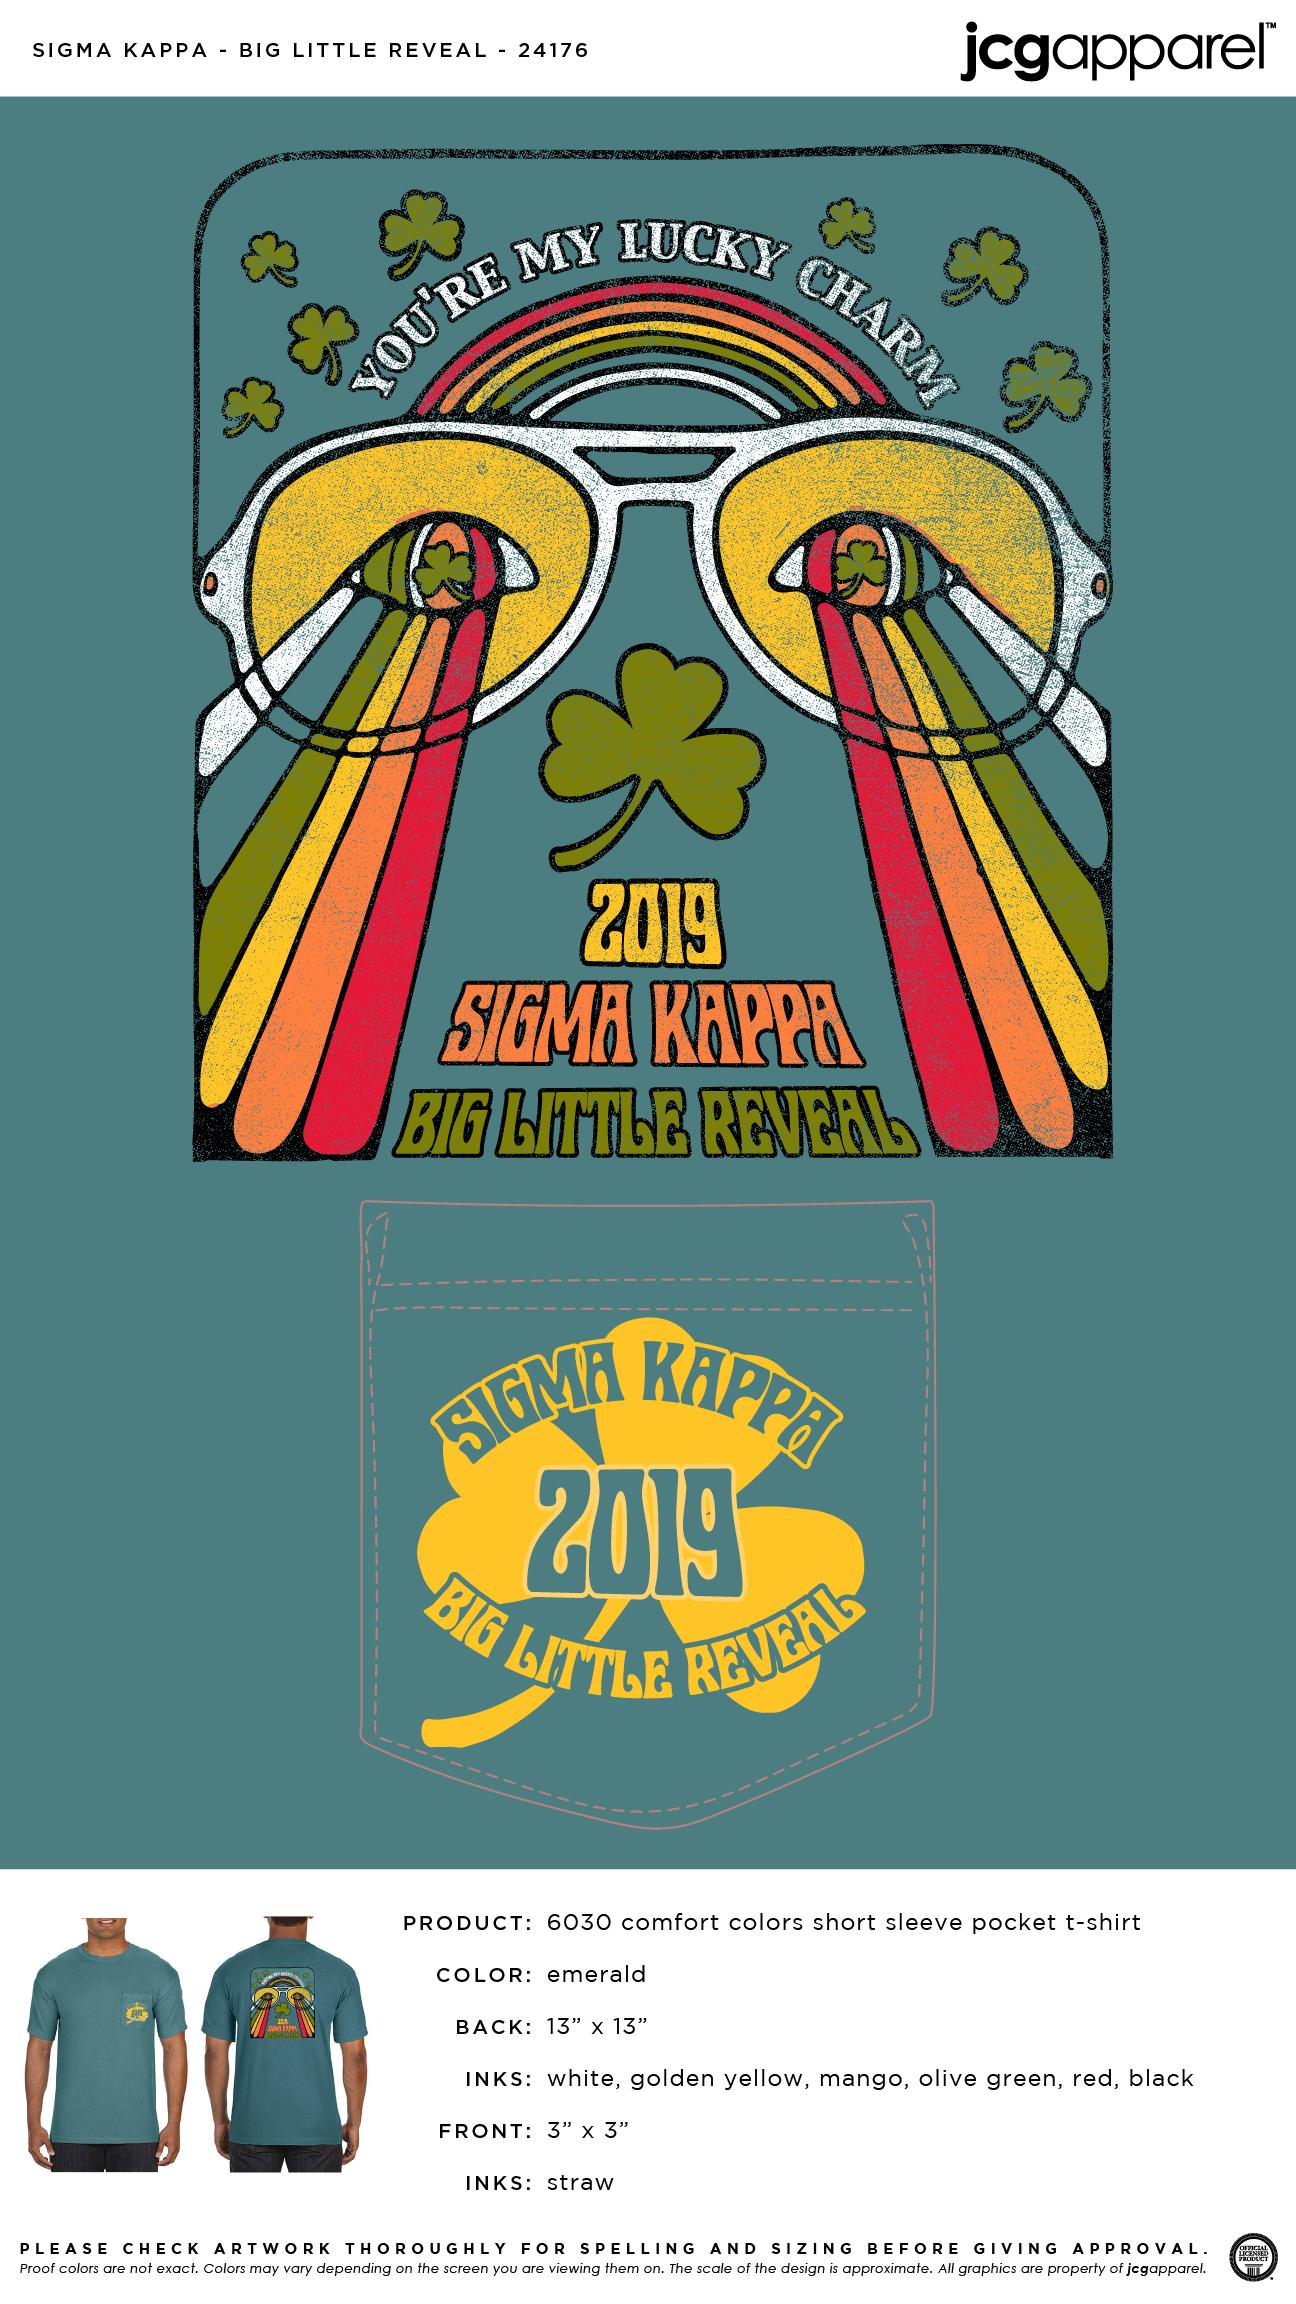 Sigma Kappa Big Little Reveal Shirt | Sorority Big Little Reveal | Greek Big Little Reveal #sigmakappa #sk #big #little #reveal #lucky #charm #sunglasses #biglittlereveal